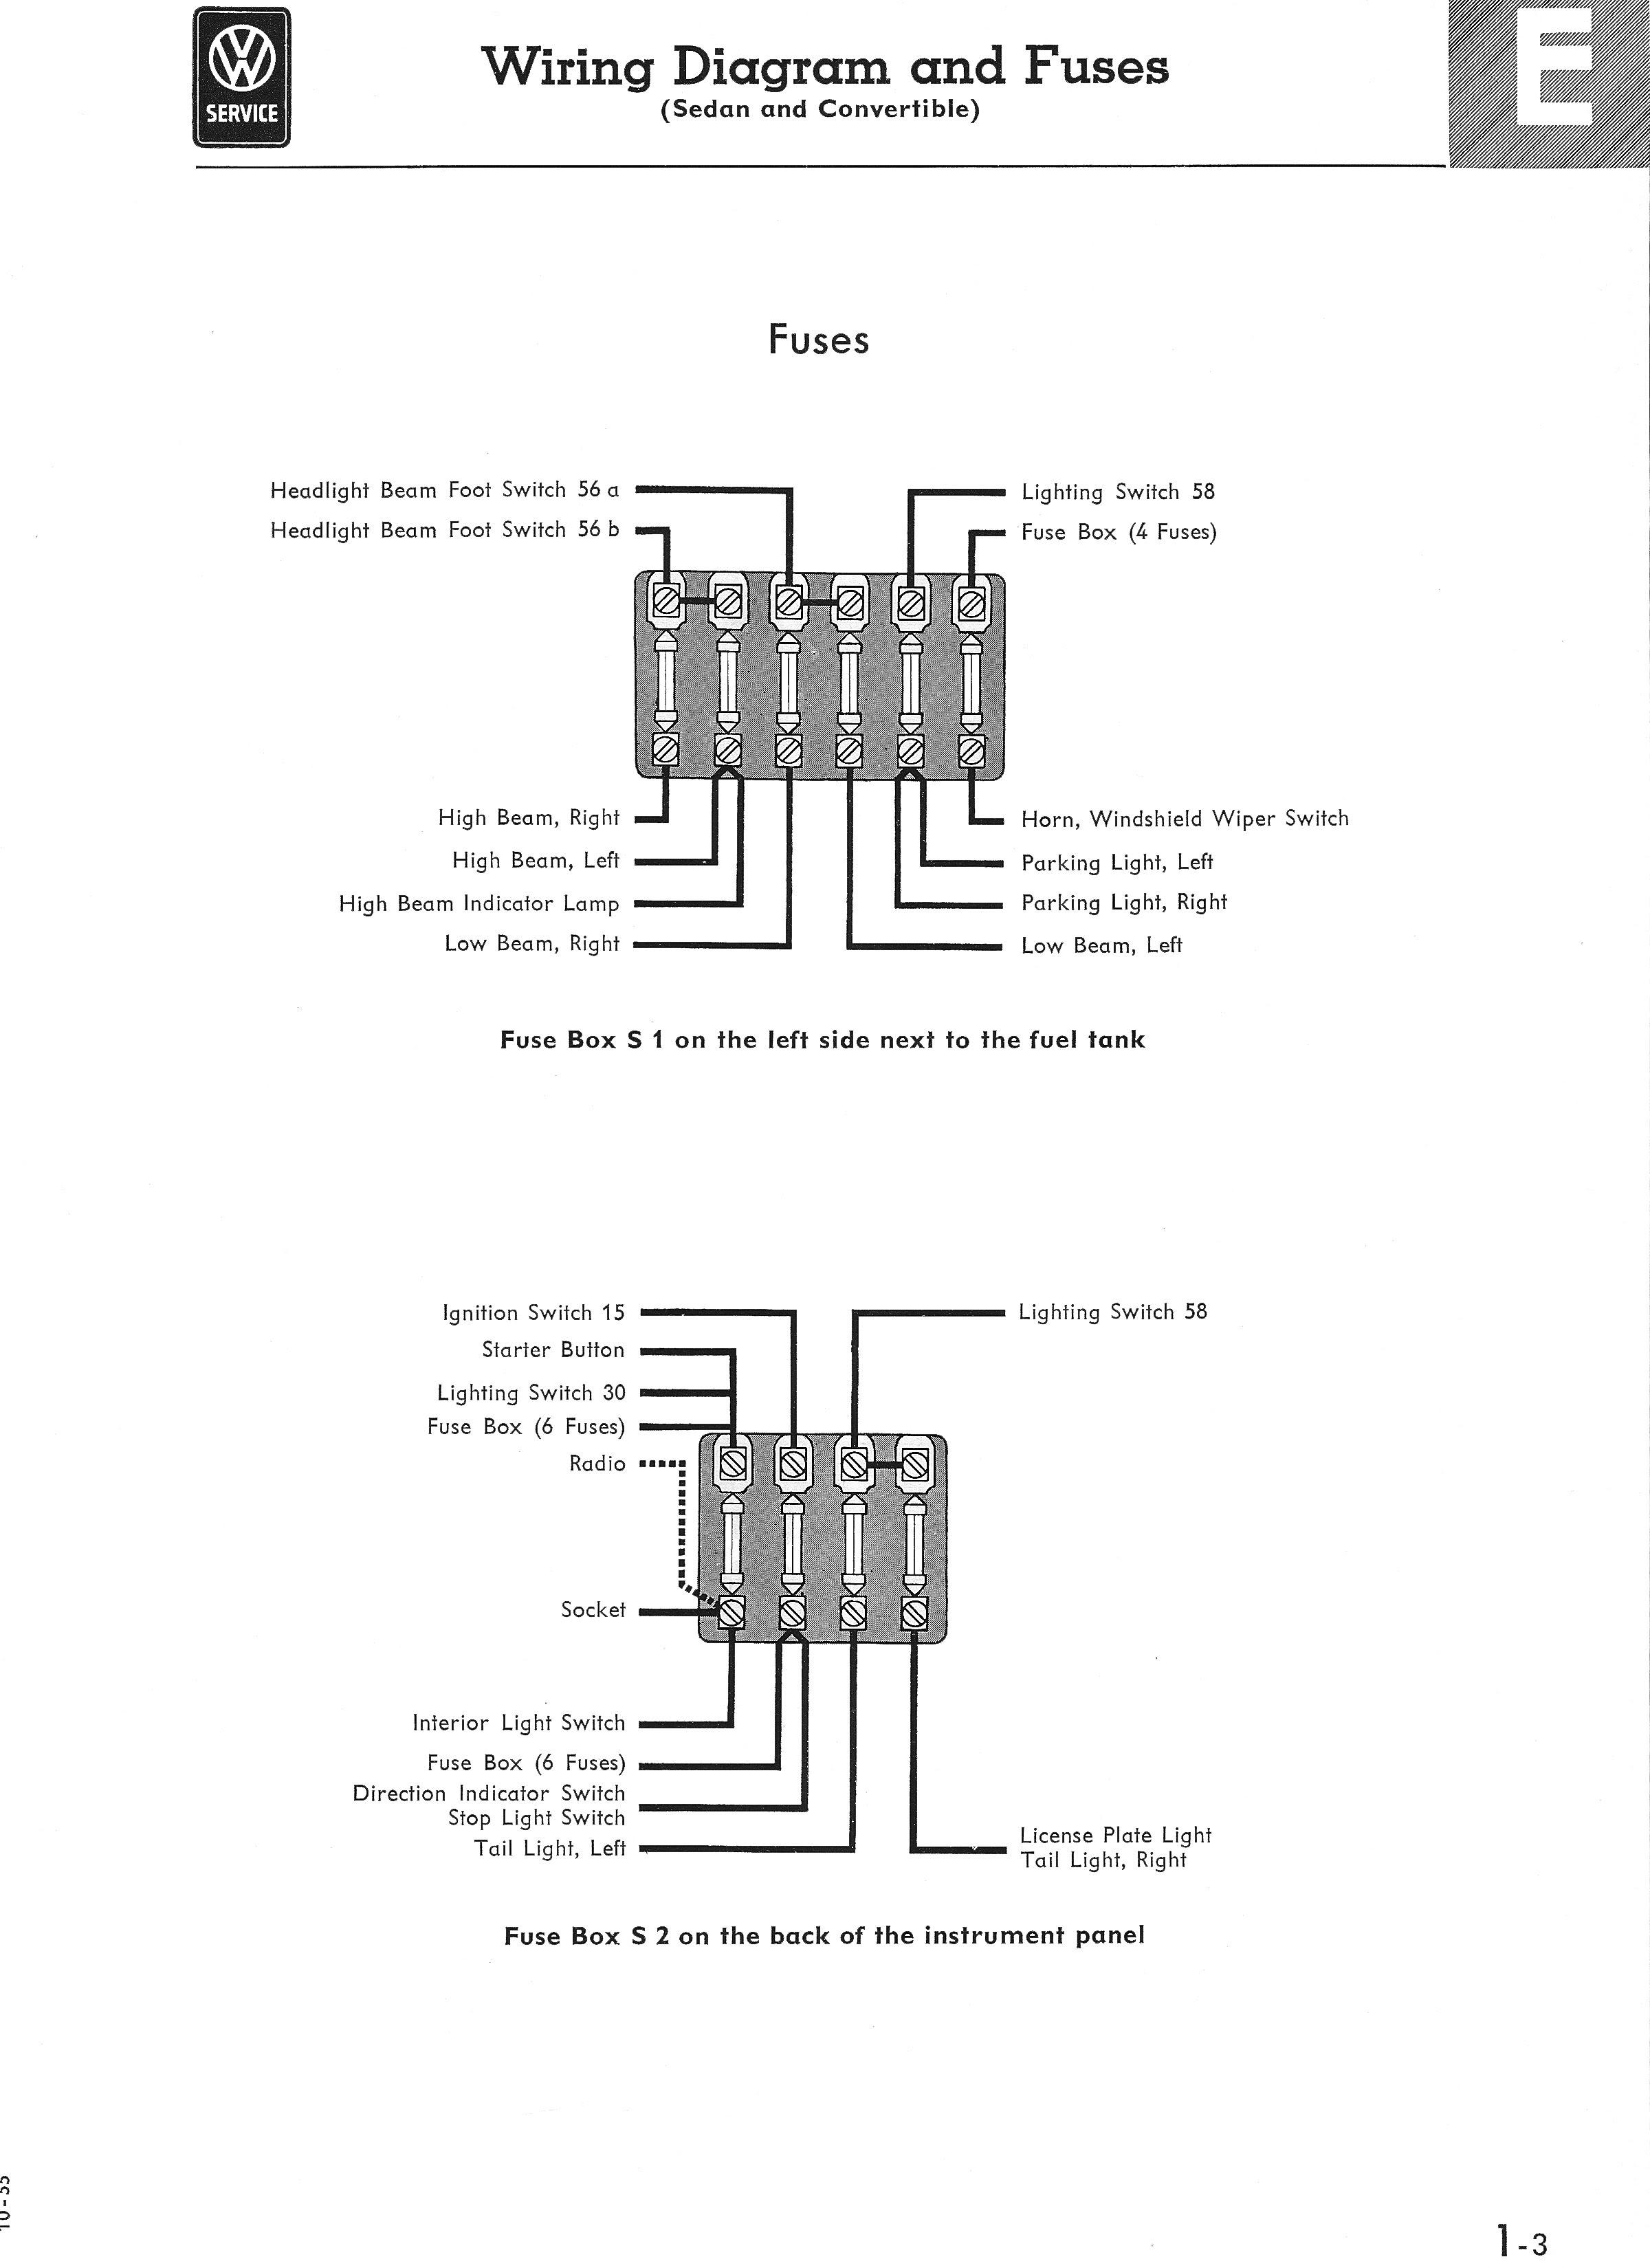 1968 vw headlight switch wiring diagram image 4